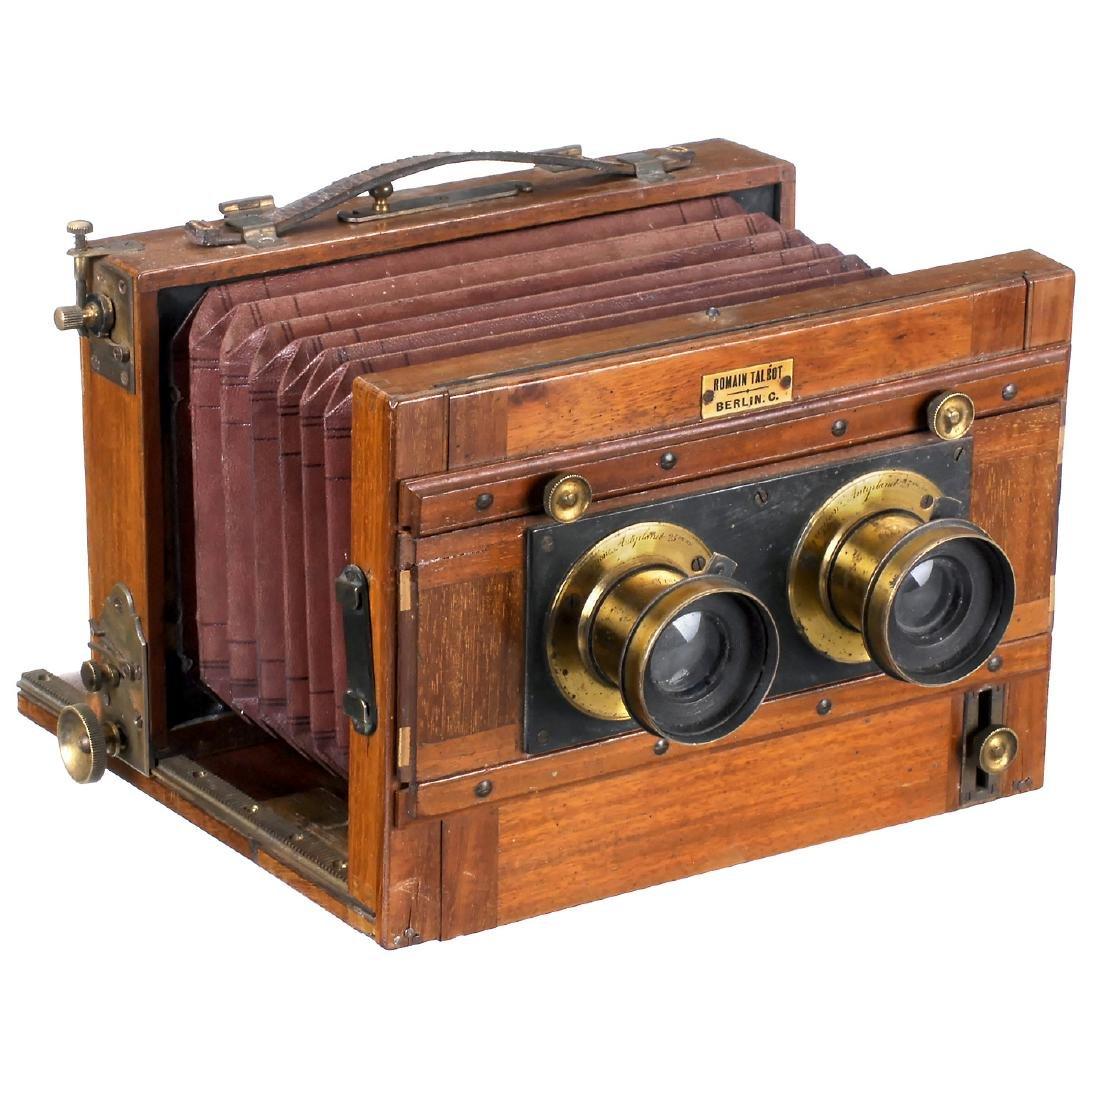 Stereo Camera 9 x 18 cm by Romain Talbot, Berlin, c. - 2